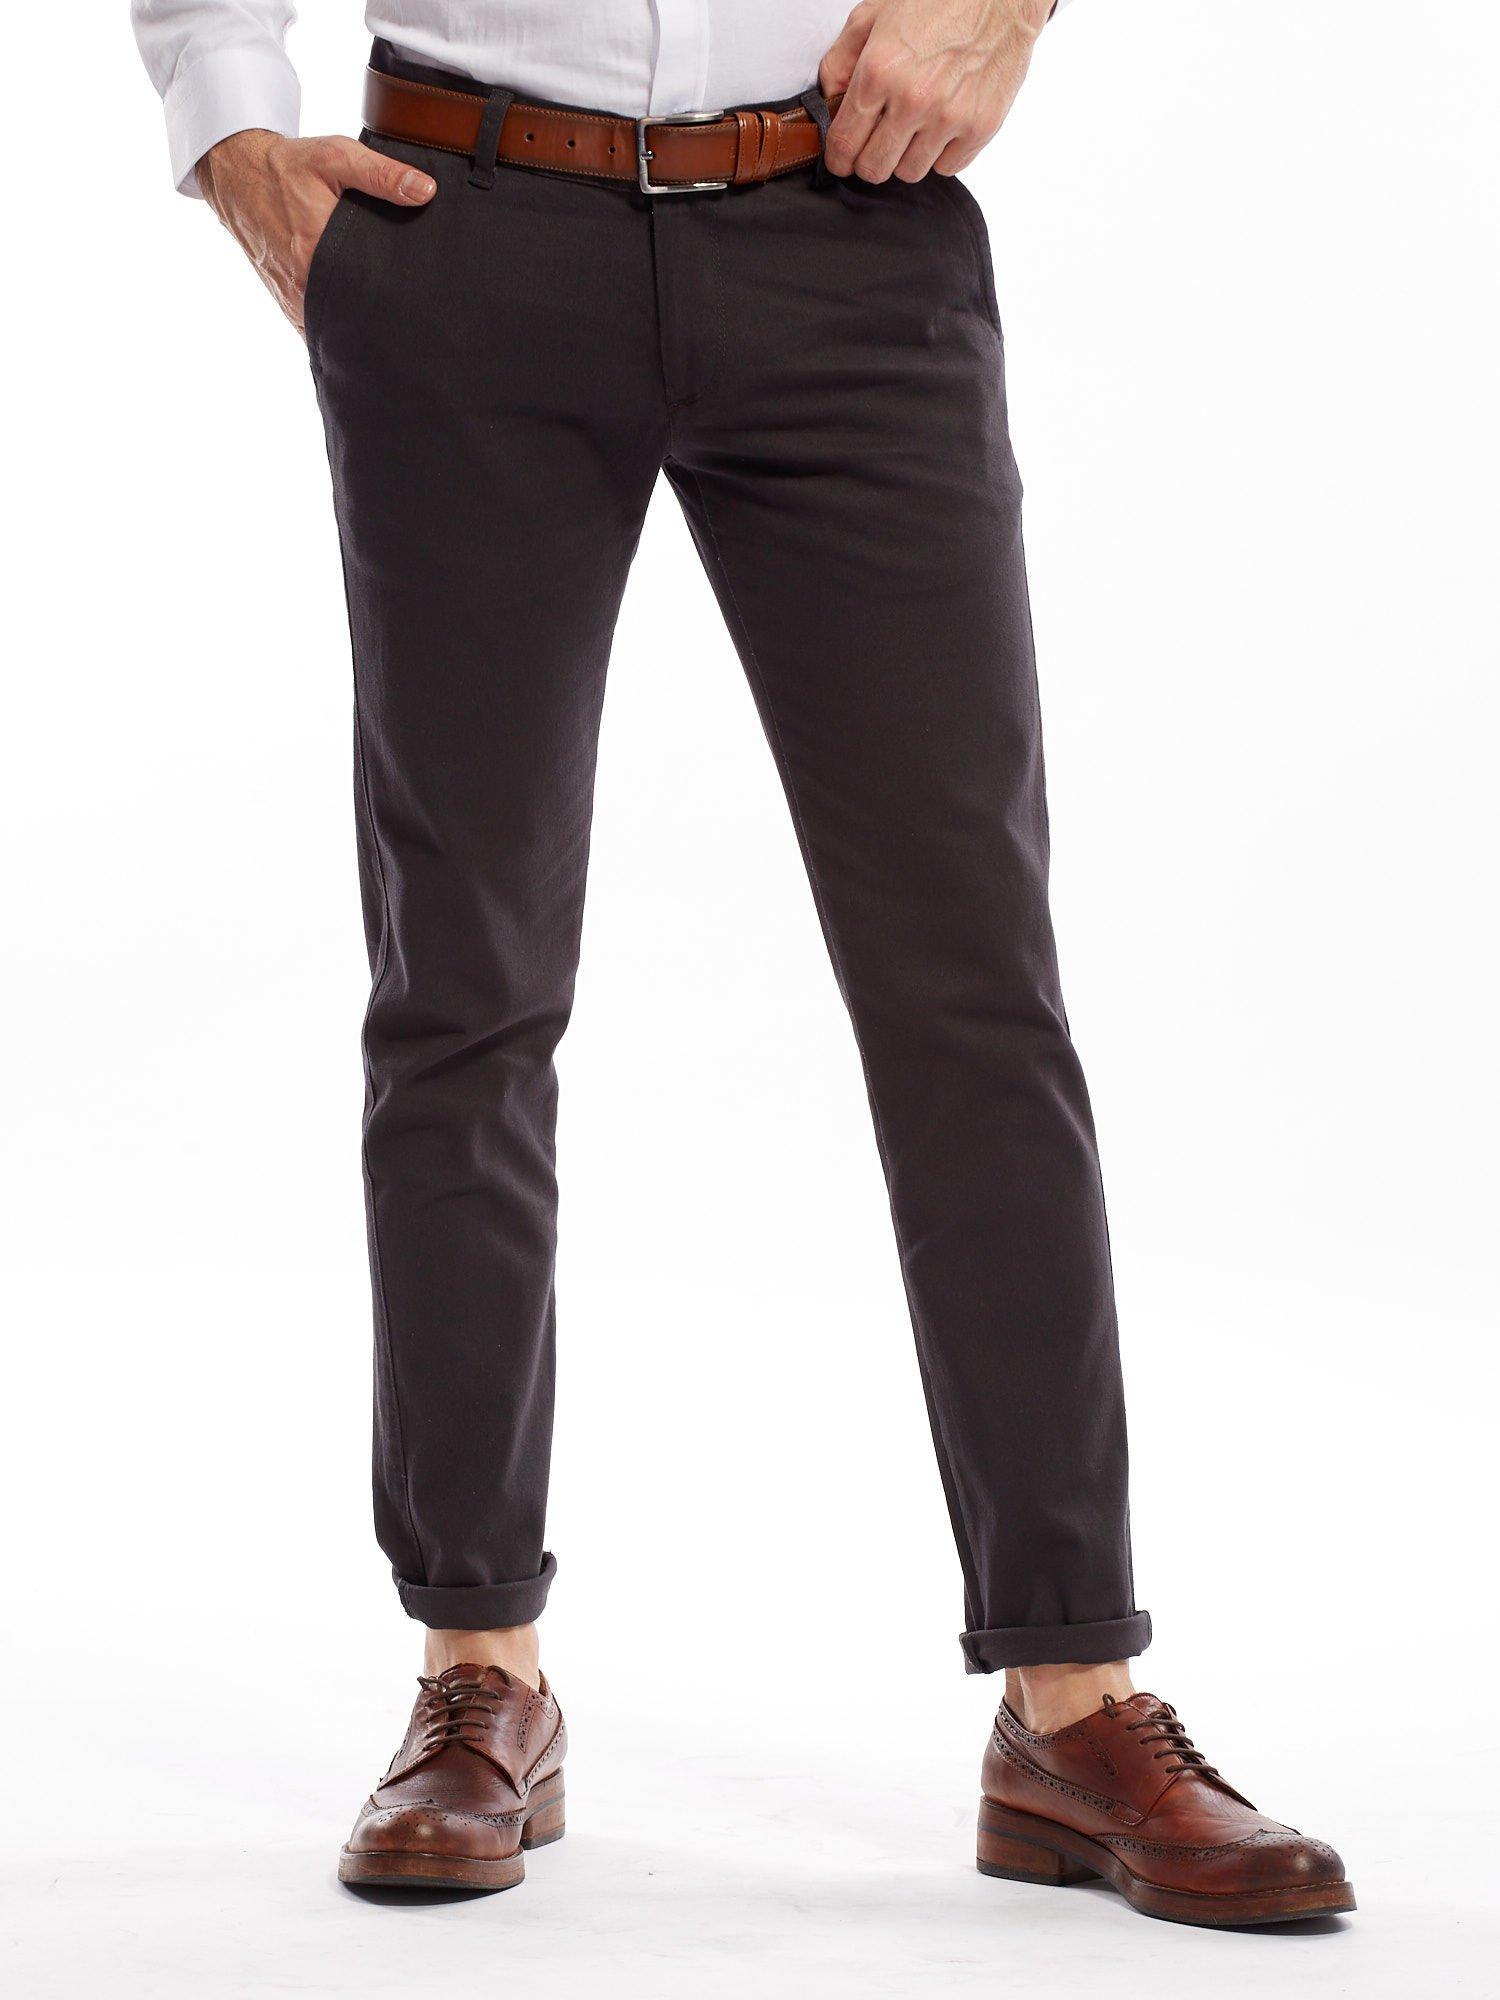 ef5dd2c5 Ciemnoszare spodnie męskie chinos - Mężczyźni Spodnie z materiału ...